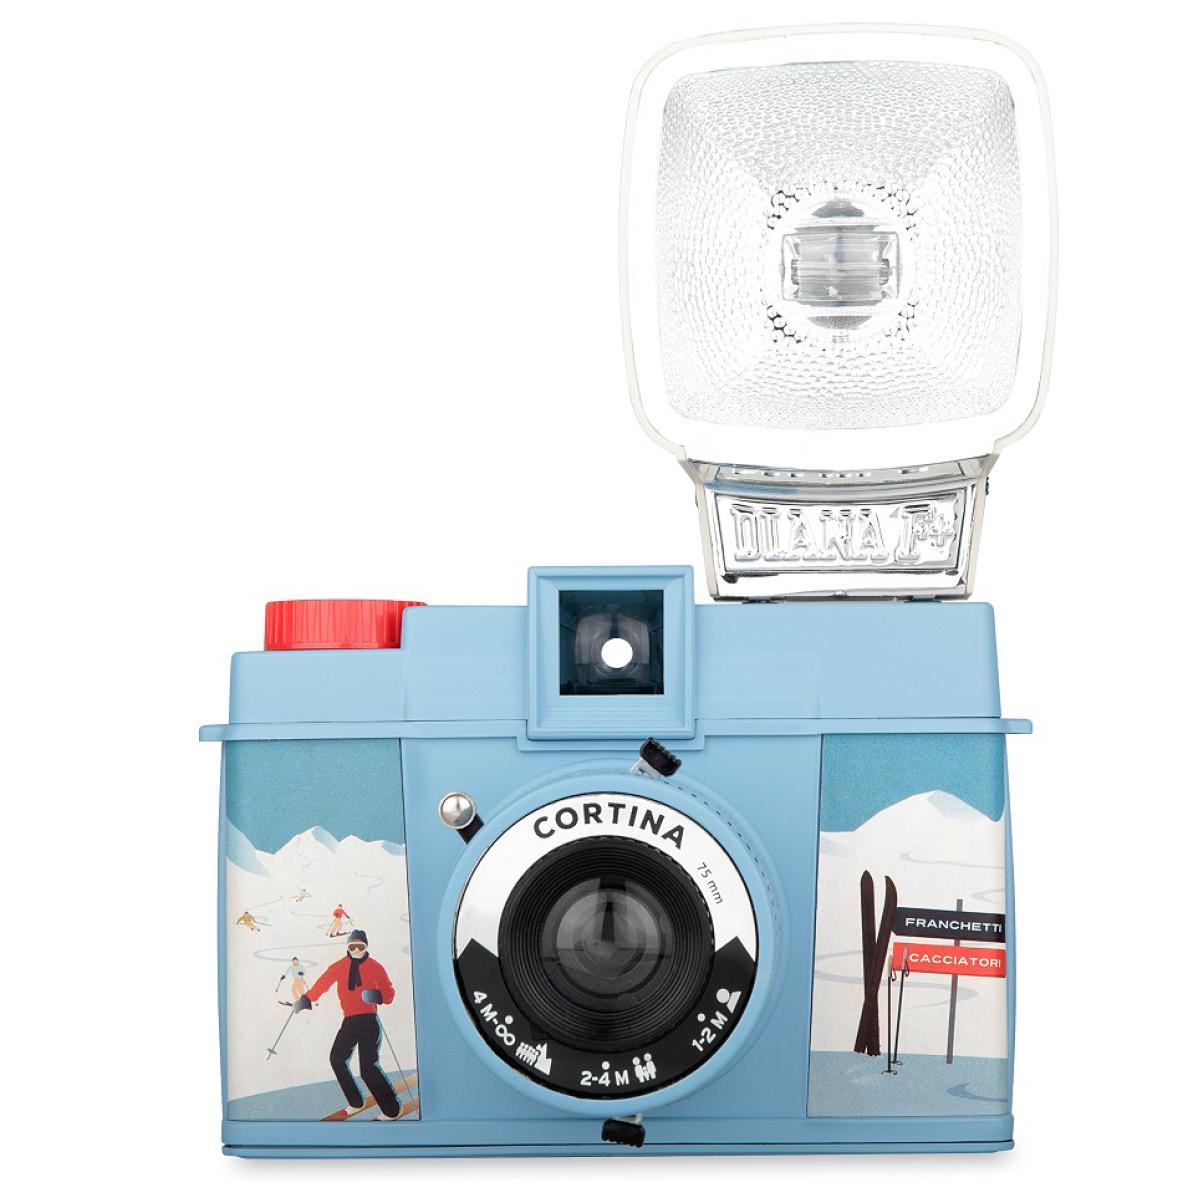 Lomo Diana F+ Camera Cortina